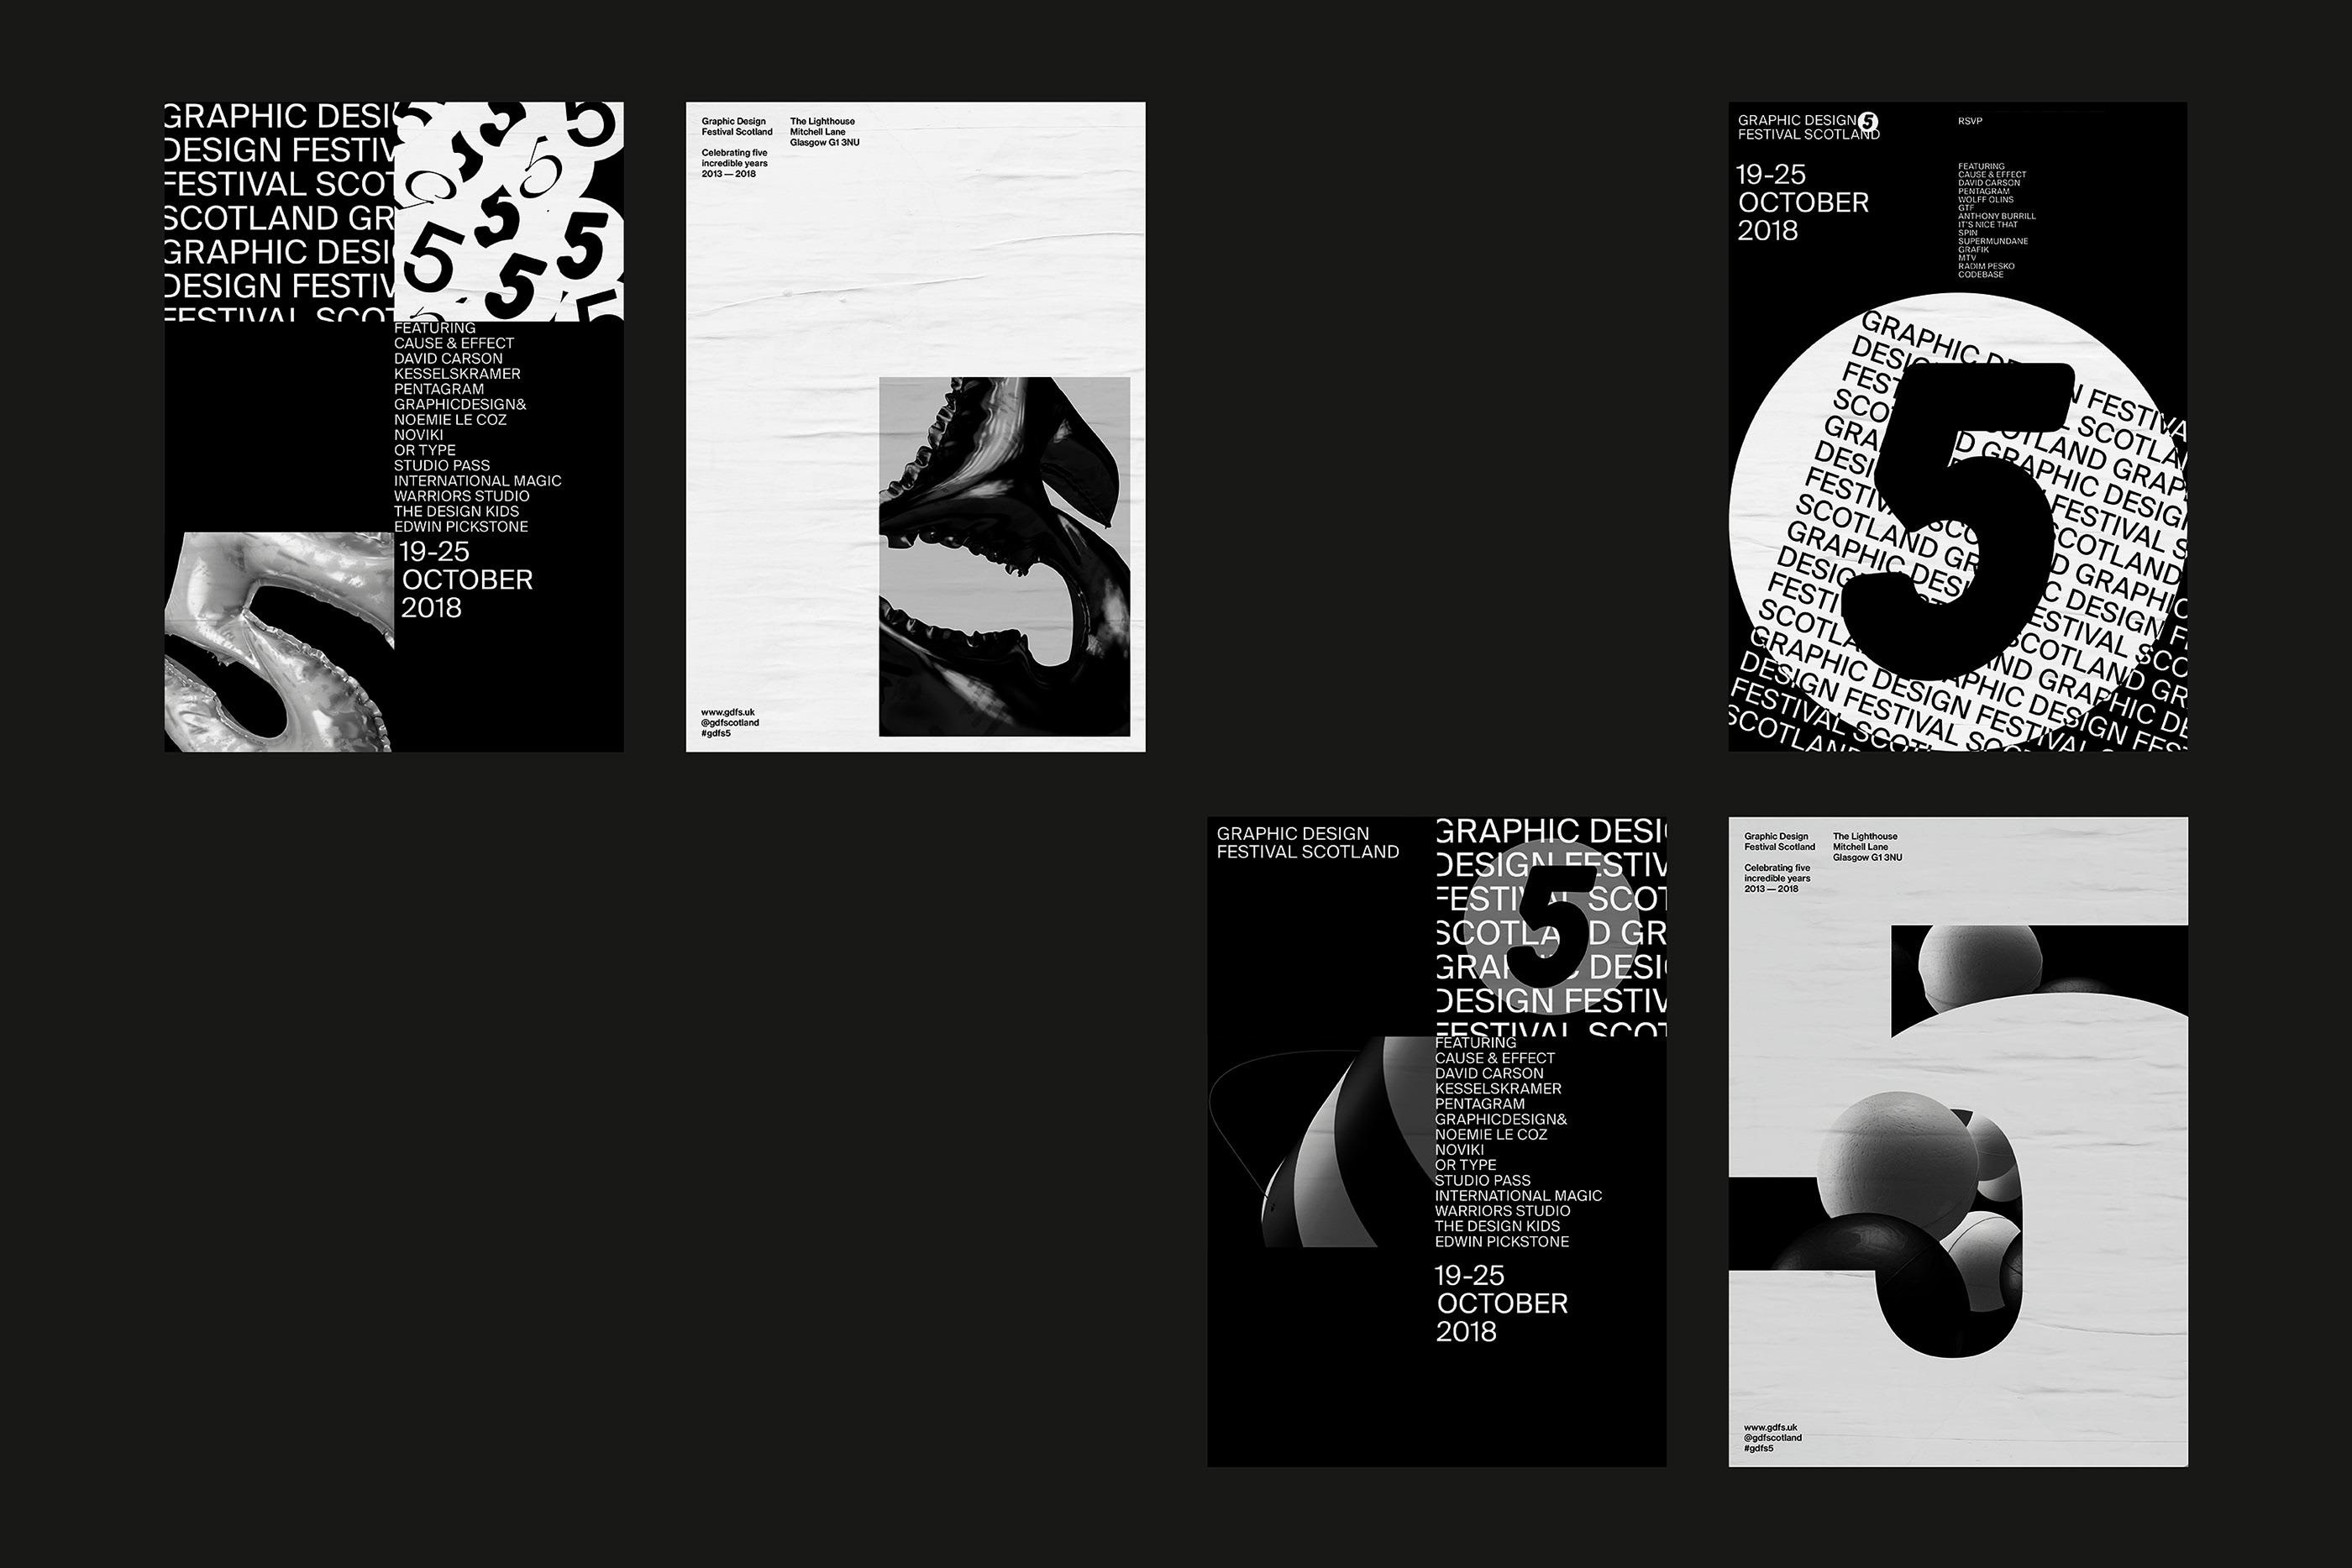 Graphic Design Festival Scotland on Behance